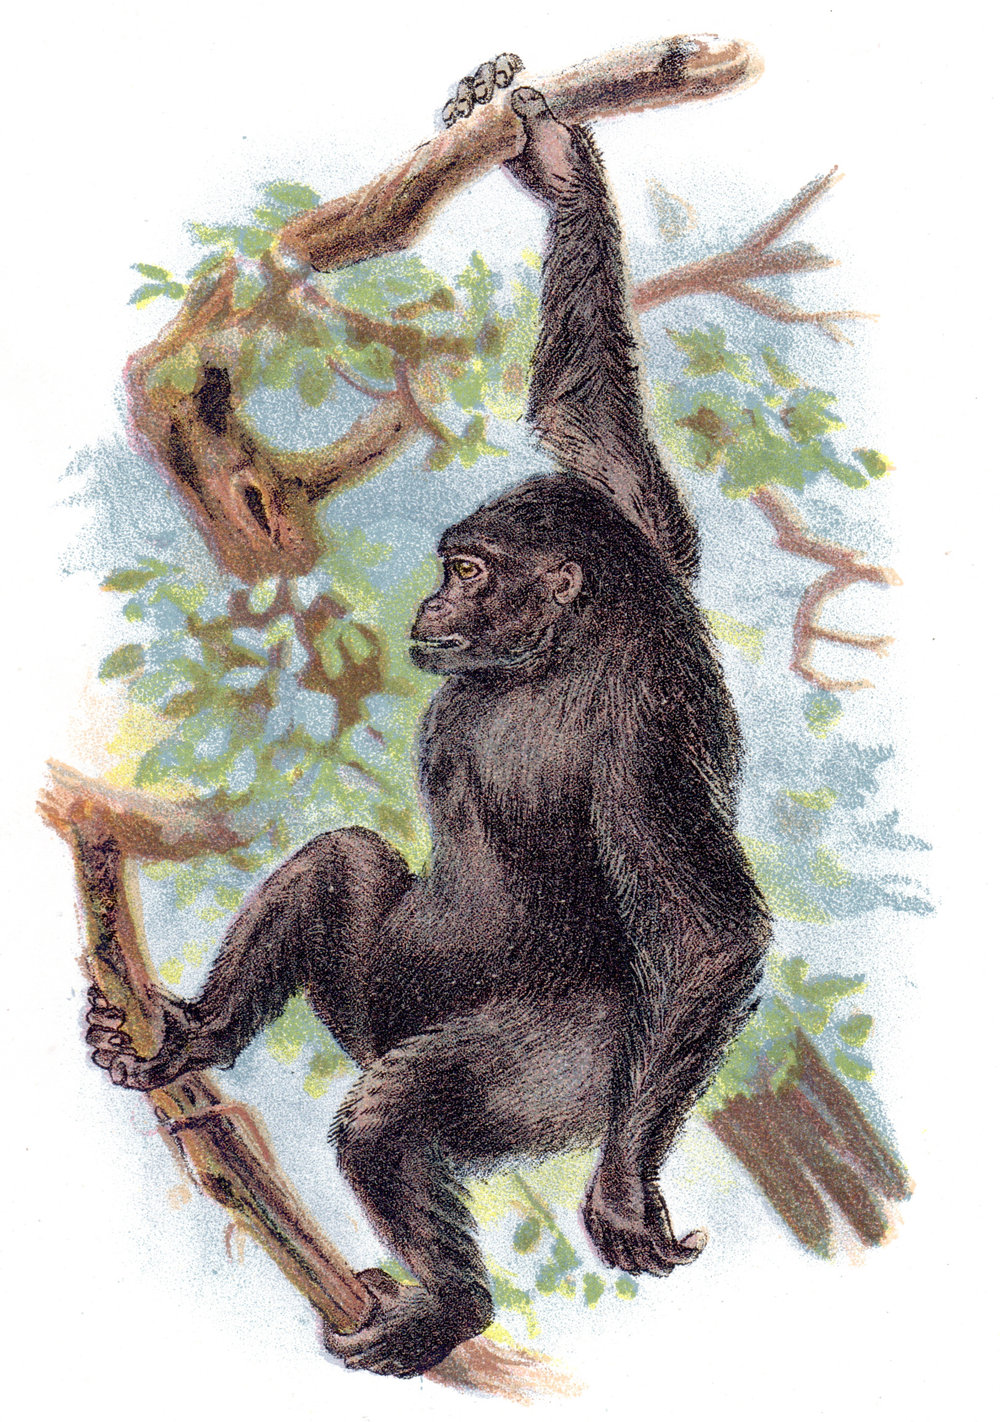 Wyman & Sons / Lloyd's Natural History –Monkeys, Apes, Primates